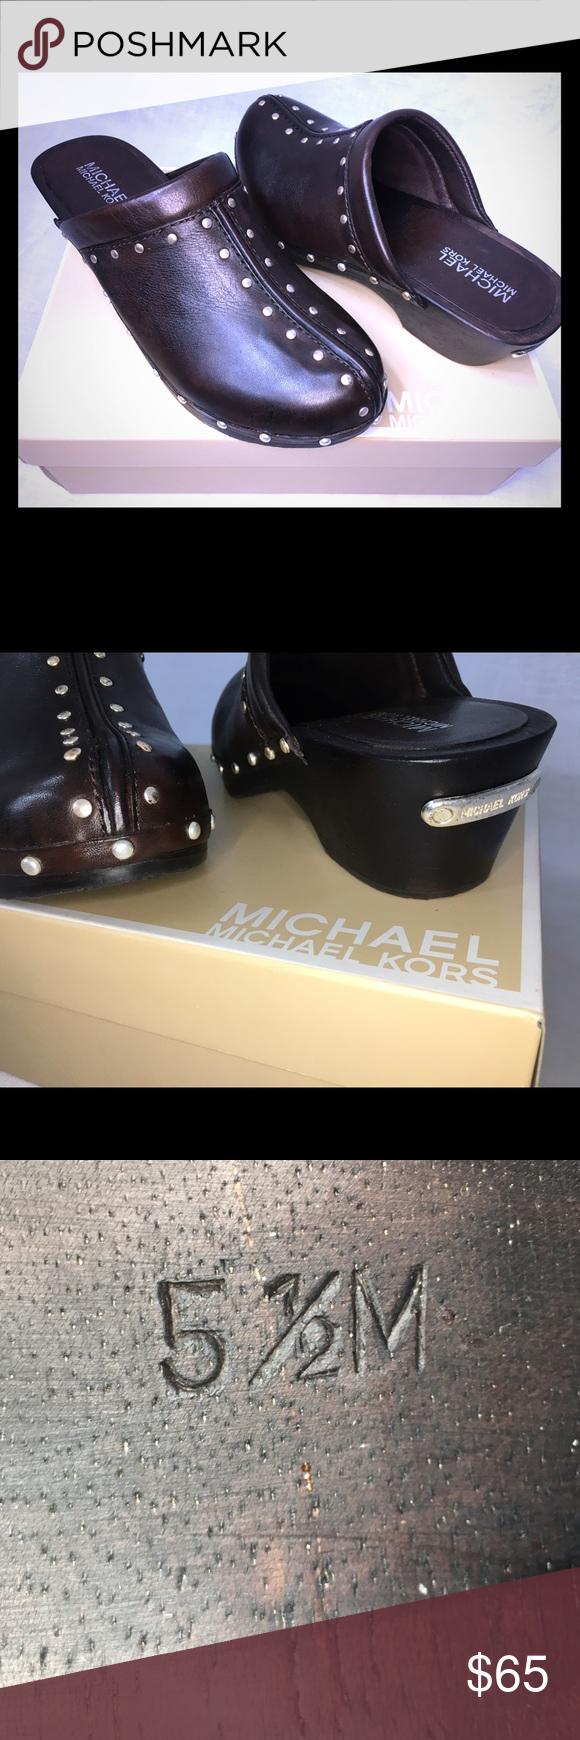 Michael Kors studded clogs (new in original box) New in original box - Michael Kors brown low studded clogs - size 5.5M Michael Kors Shoes Mules & Clogs